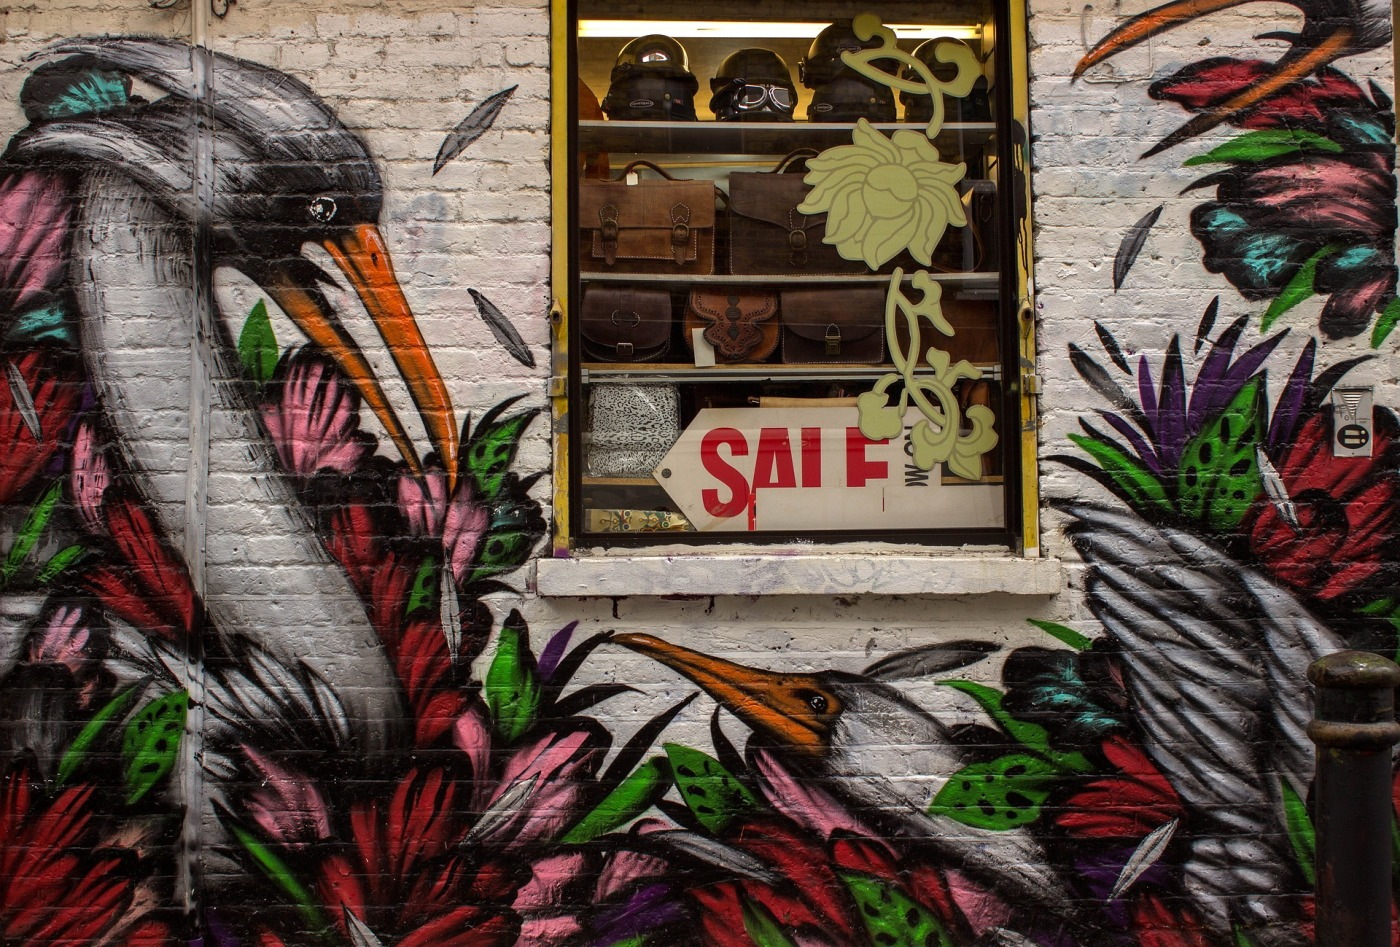 street-art-2044090_1920